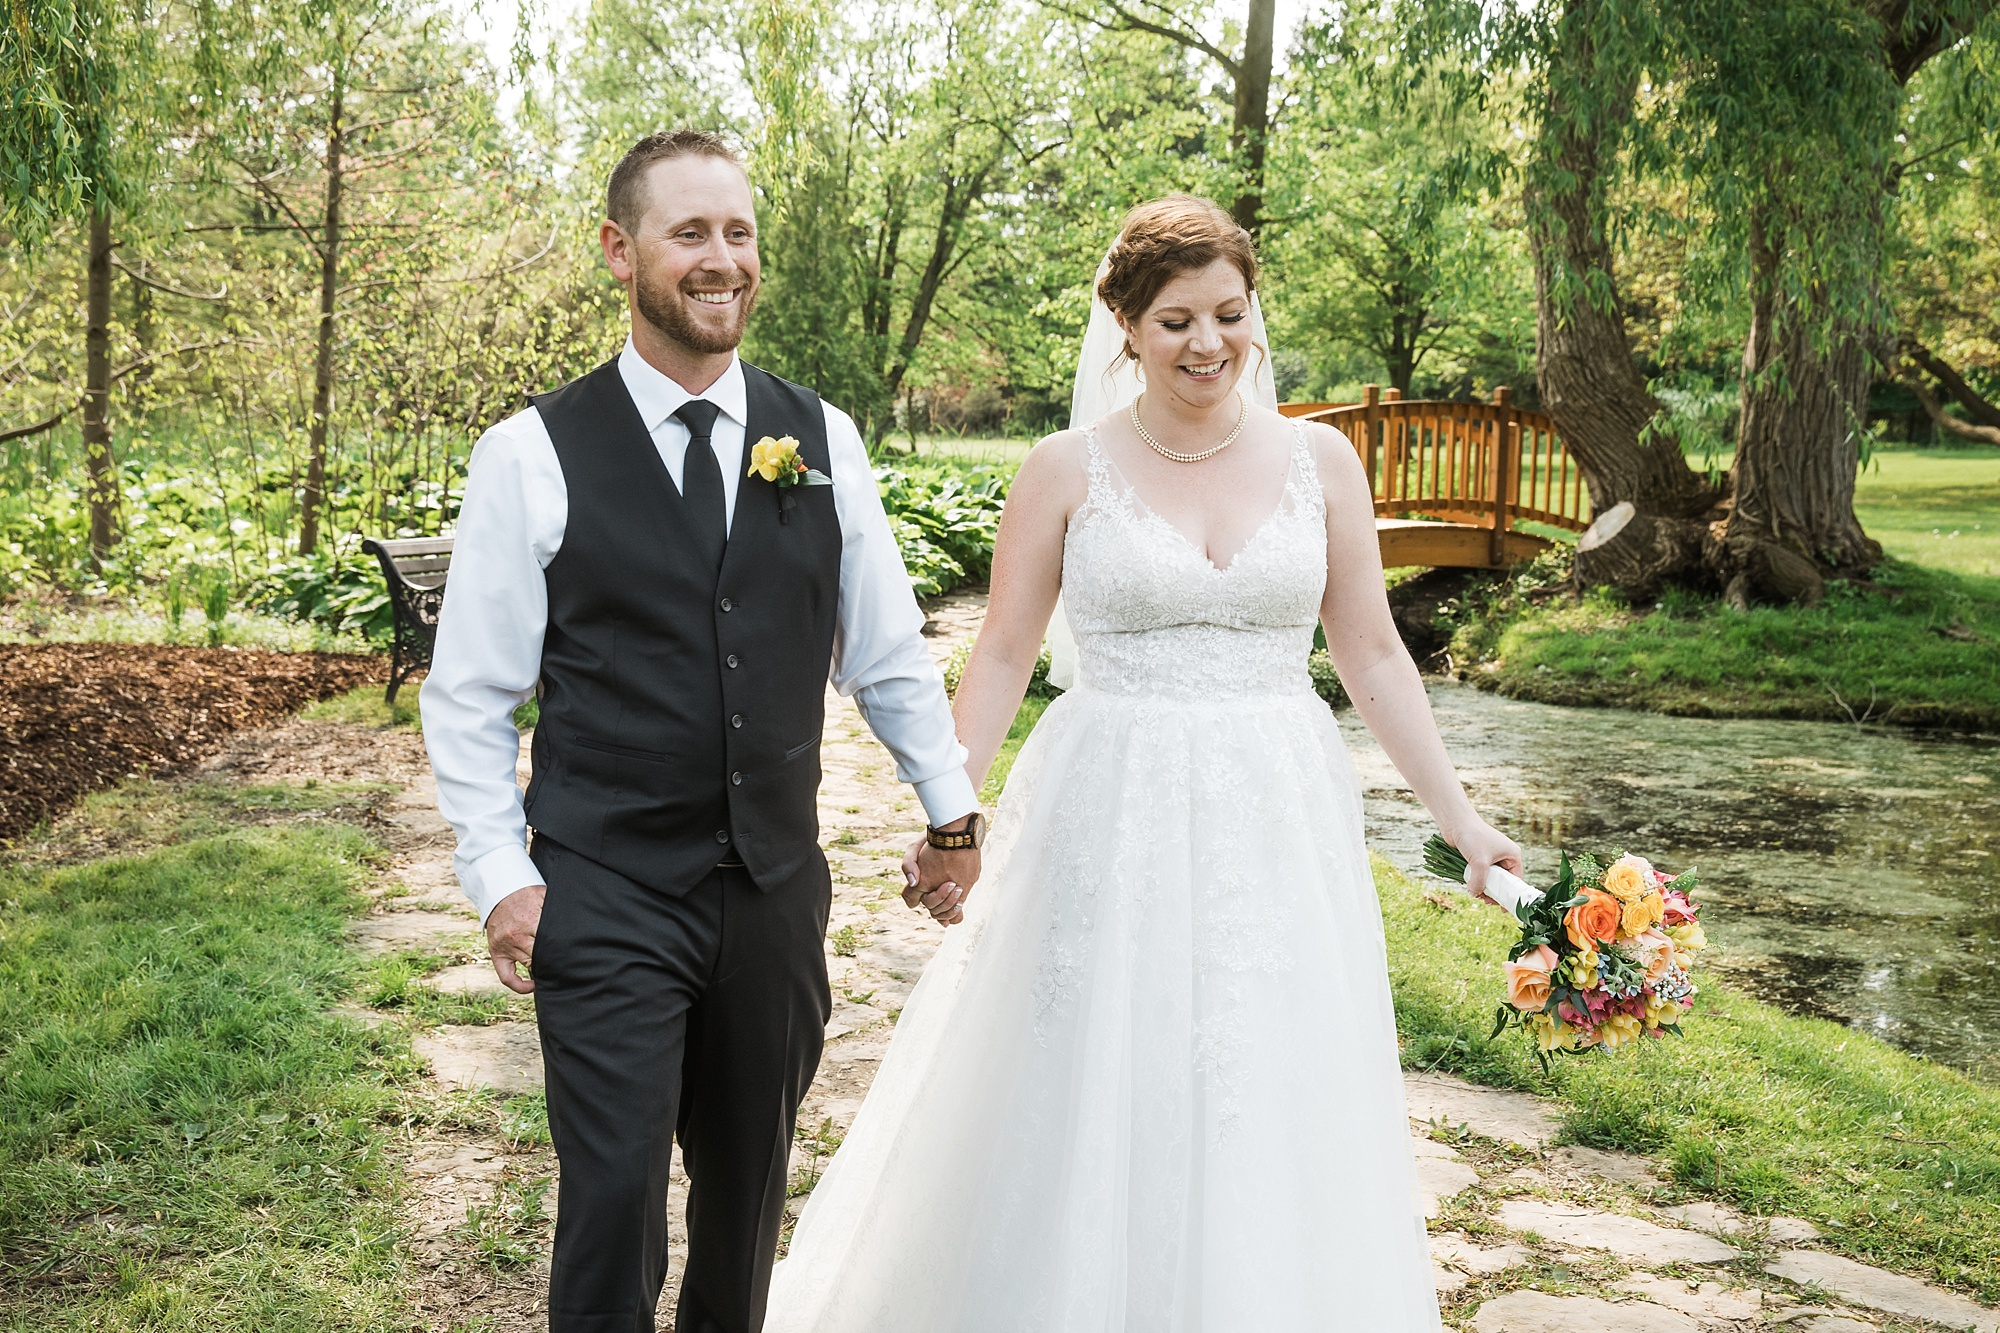 niagarafalls-weddingphotography_0030.jpg